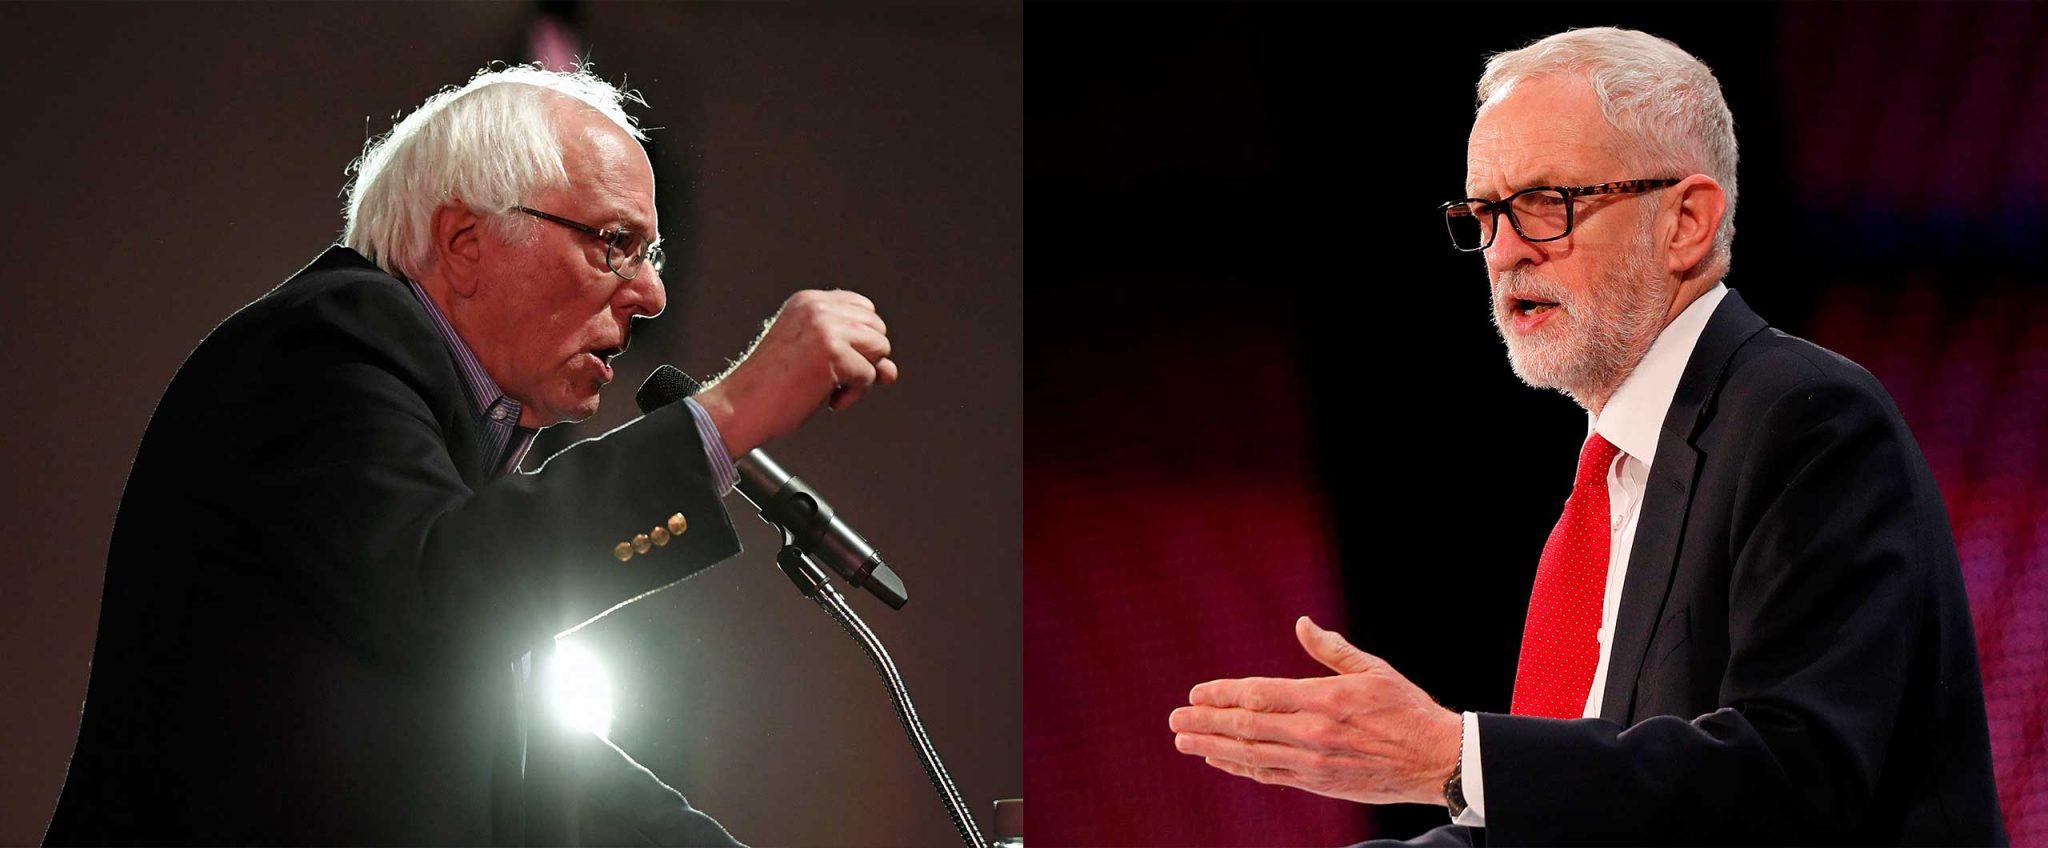 Berni Sanders i Džeremi Korbin (Getty Images, AFP)